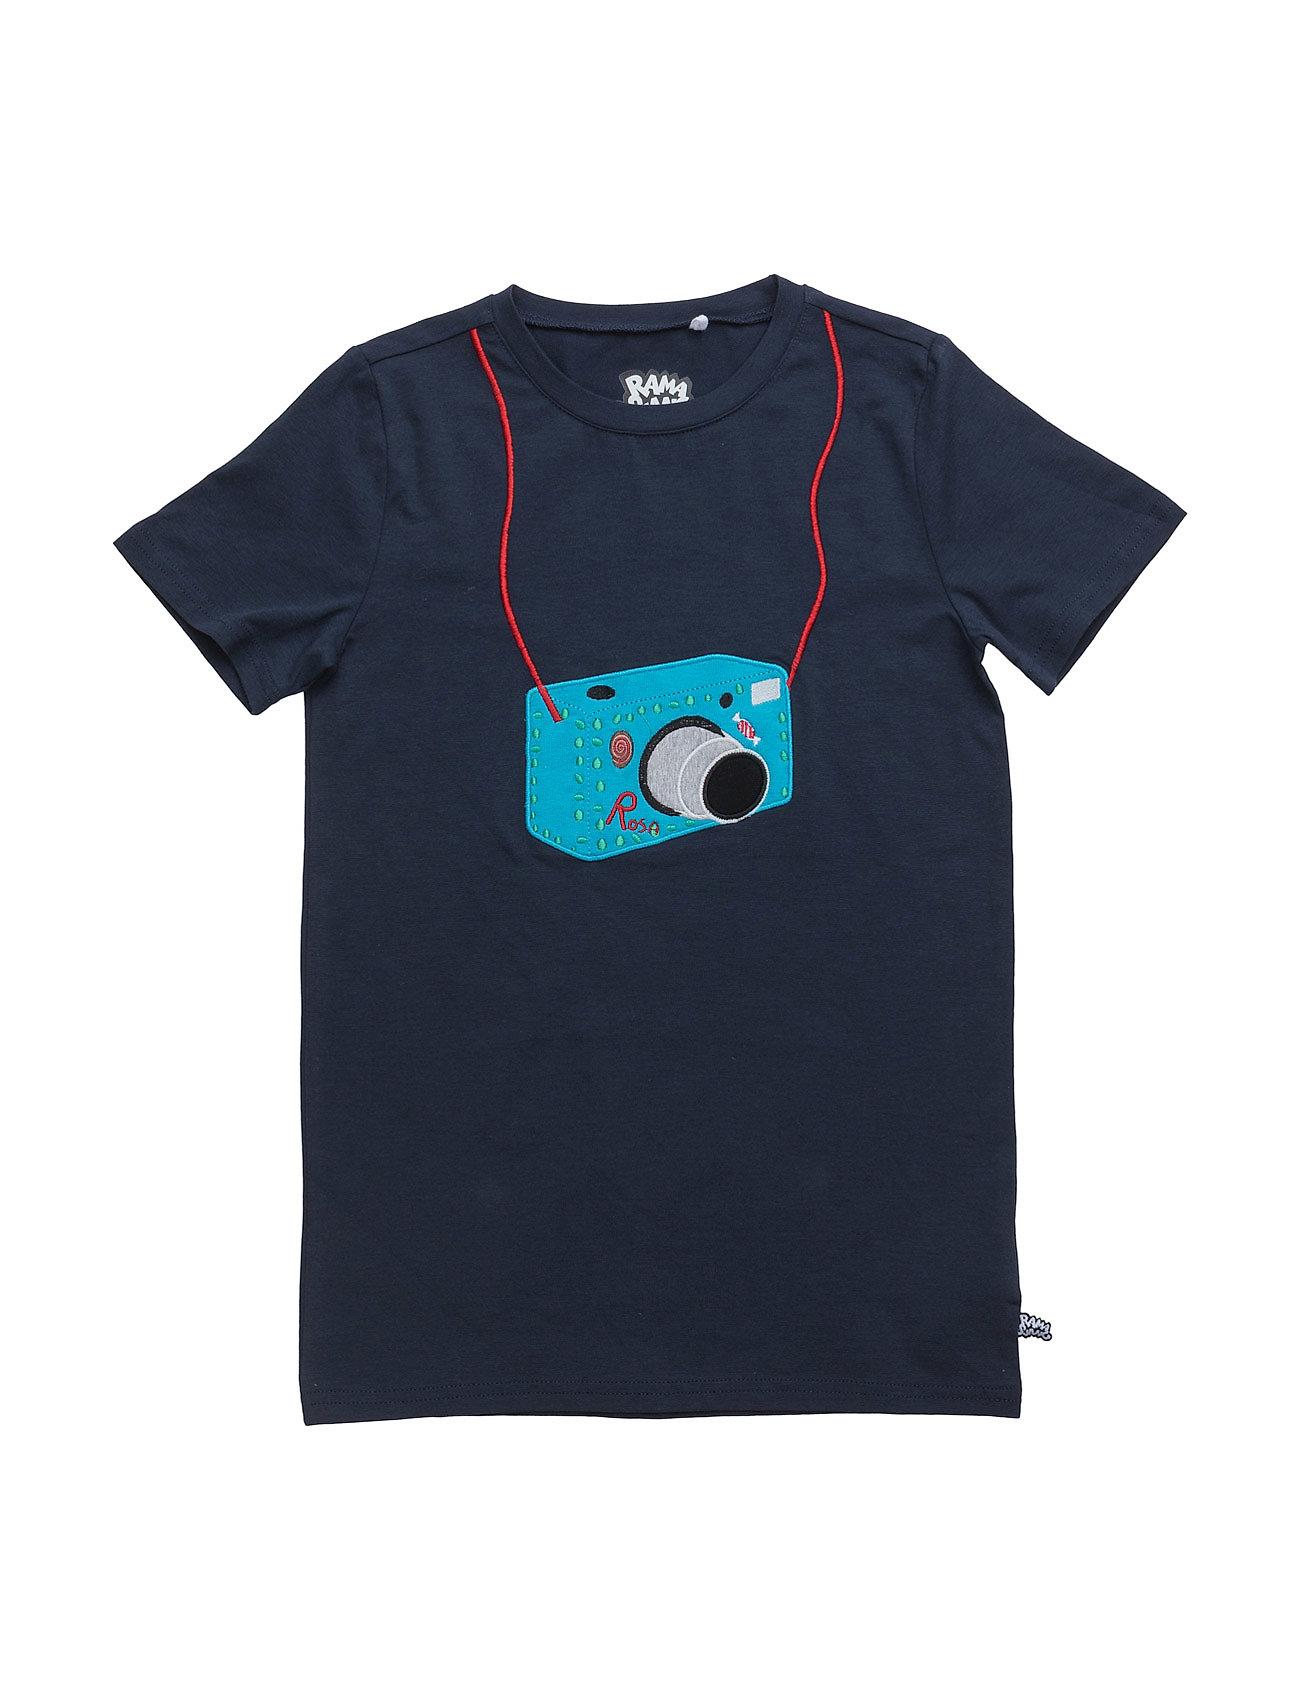 Rosa Spion Kamera T Ramasjang Kluns by Green Cotton T-shirts til Drenge i Navy blå